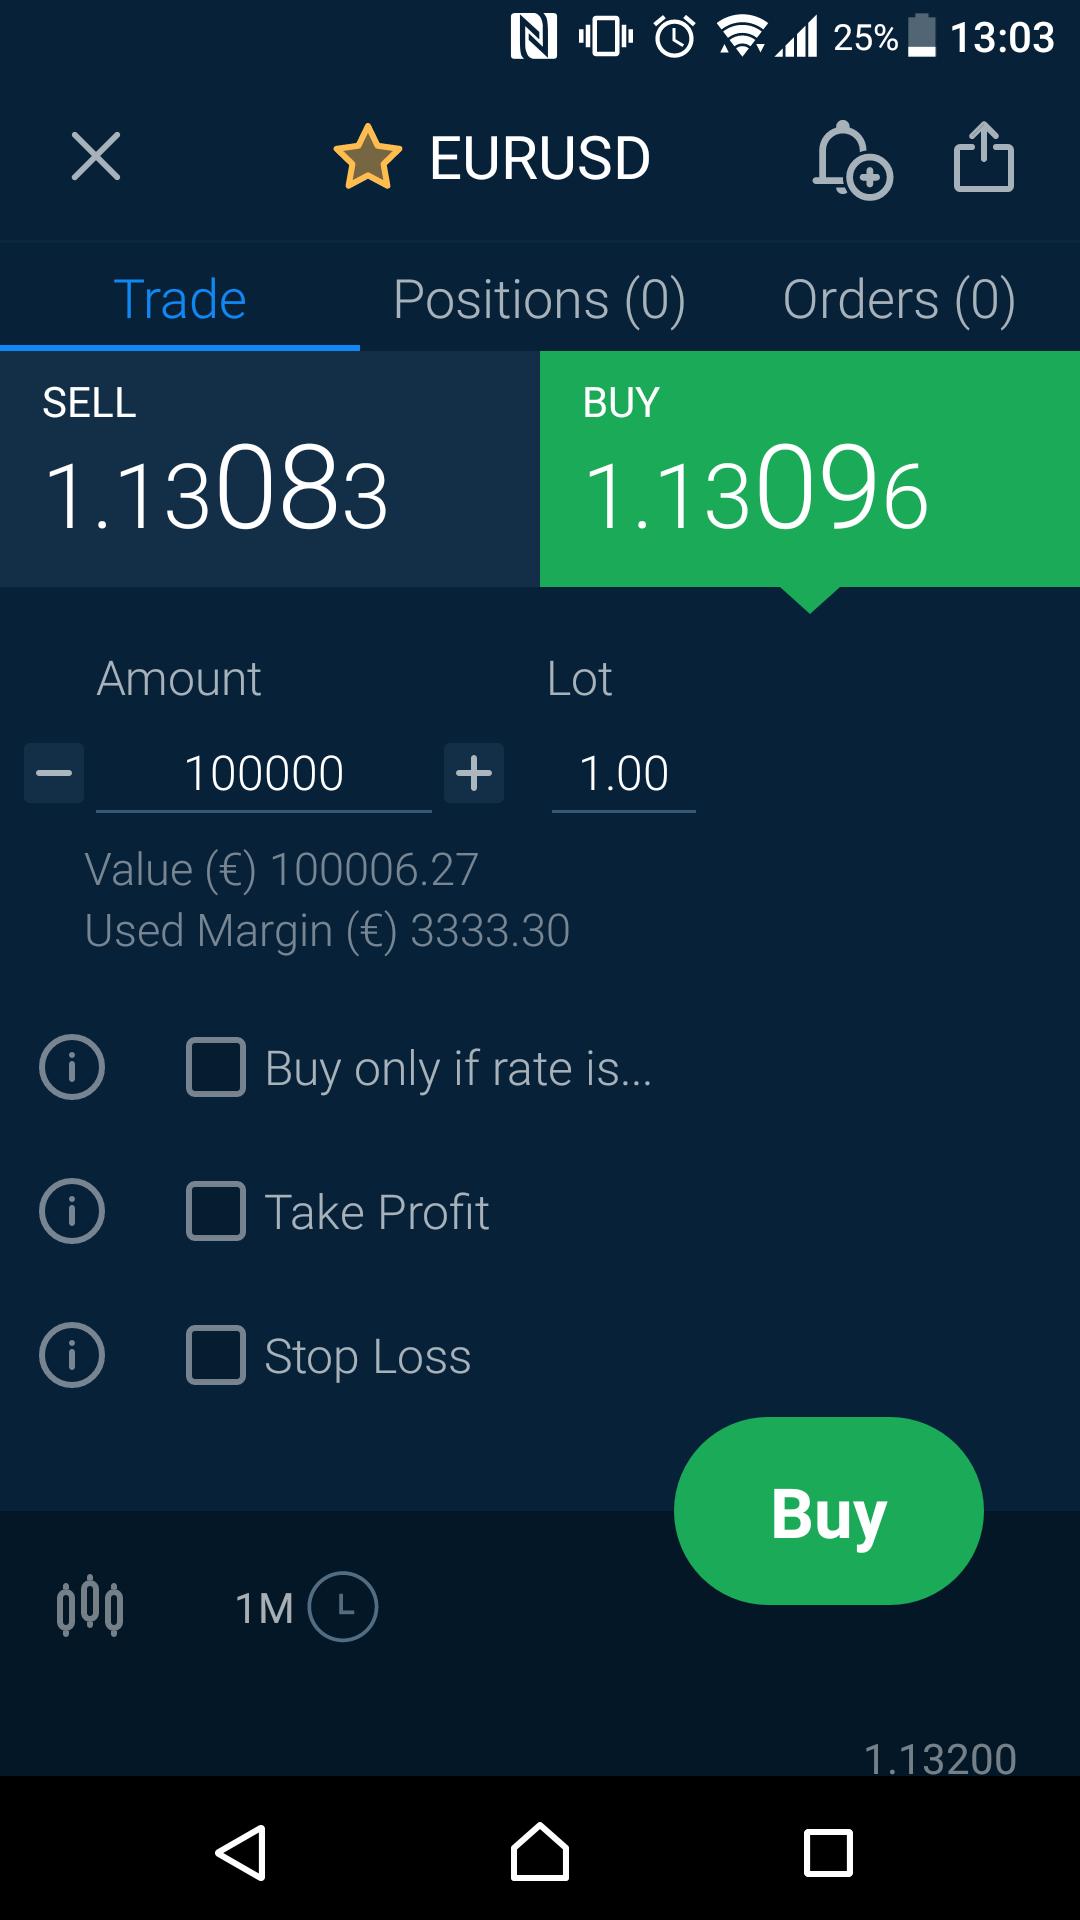 AvaTrade review - Mobile trading platform - Order panel